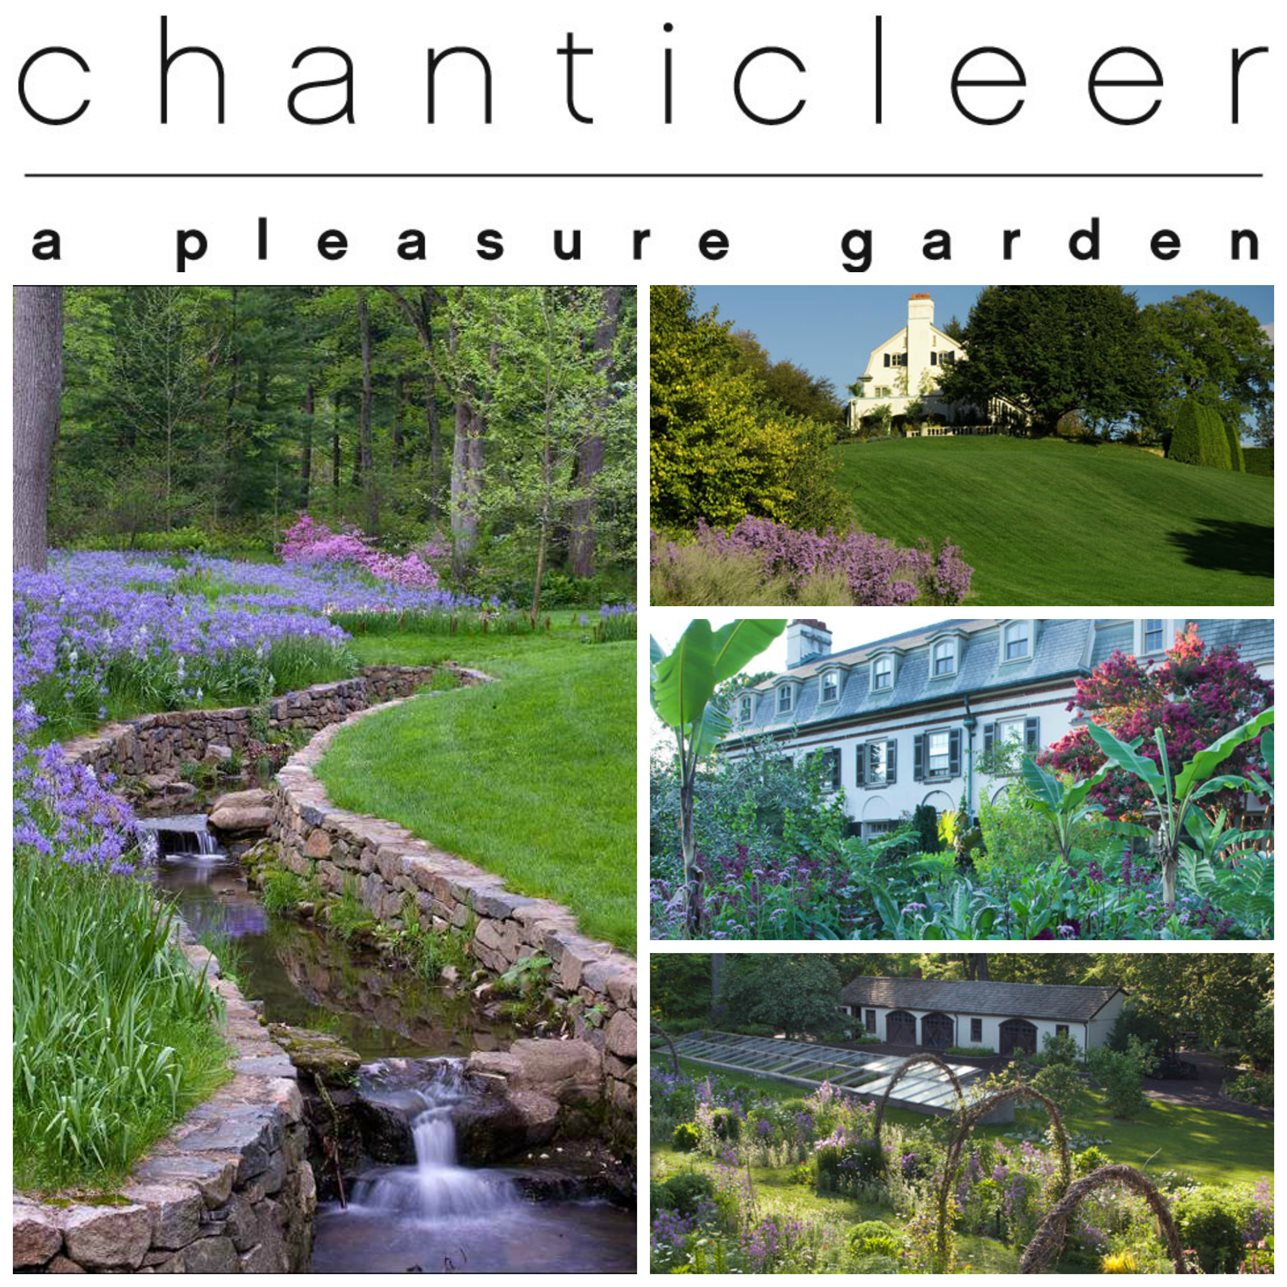 Chanticleer Collage 7 Elegant Watering Essentials Garden Design Calimesa, CA